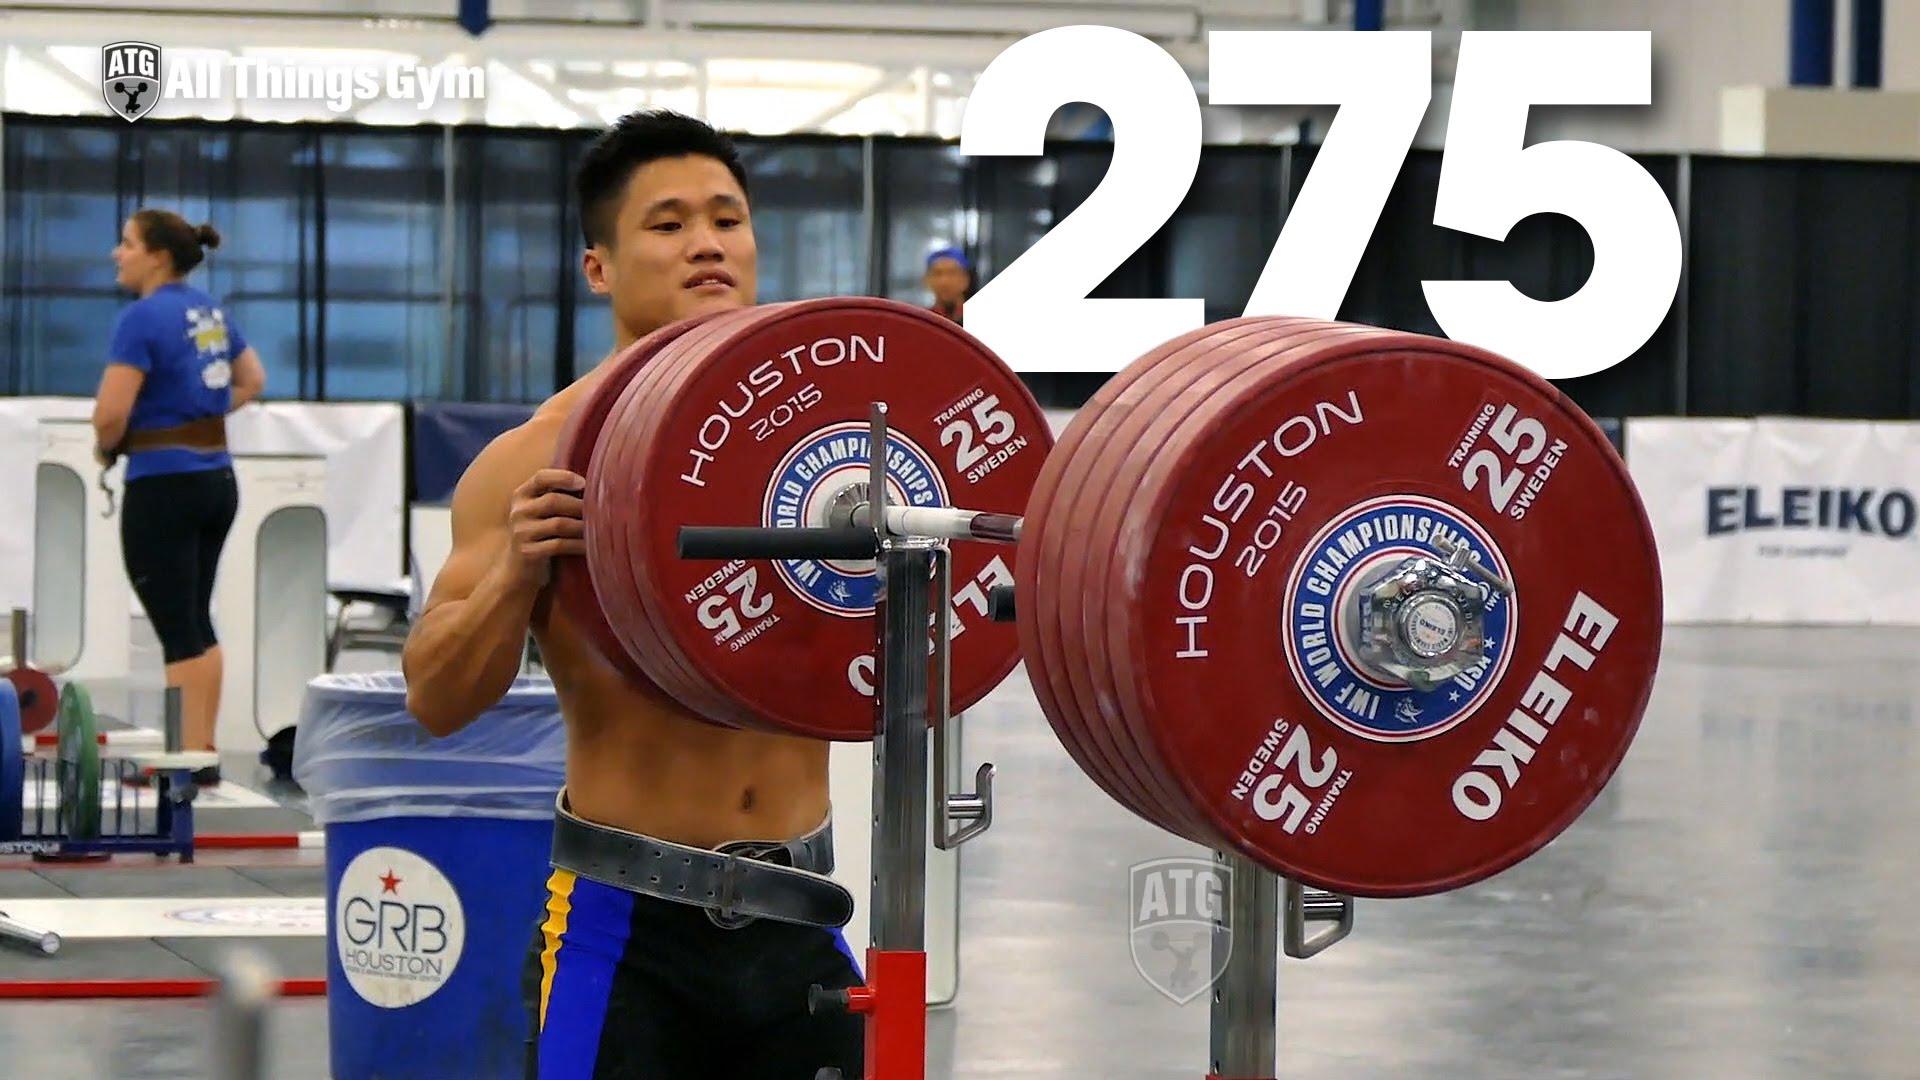 Lu Xiaojun Squatting up to 275kg + Warm Up - All Things Gym